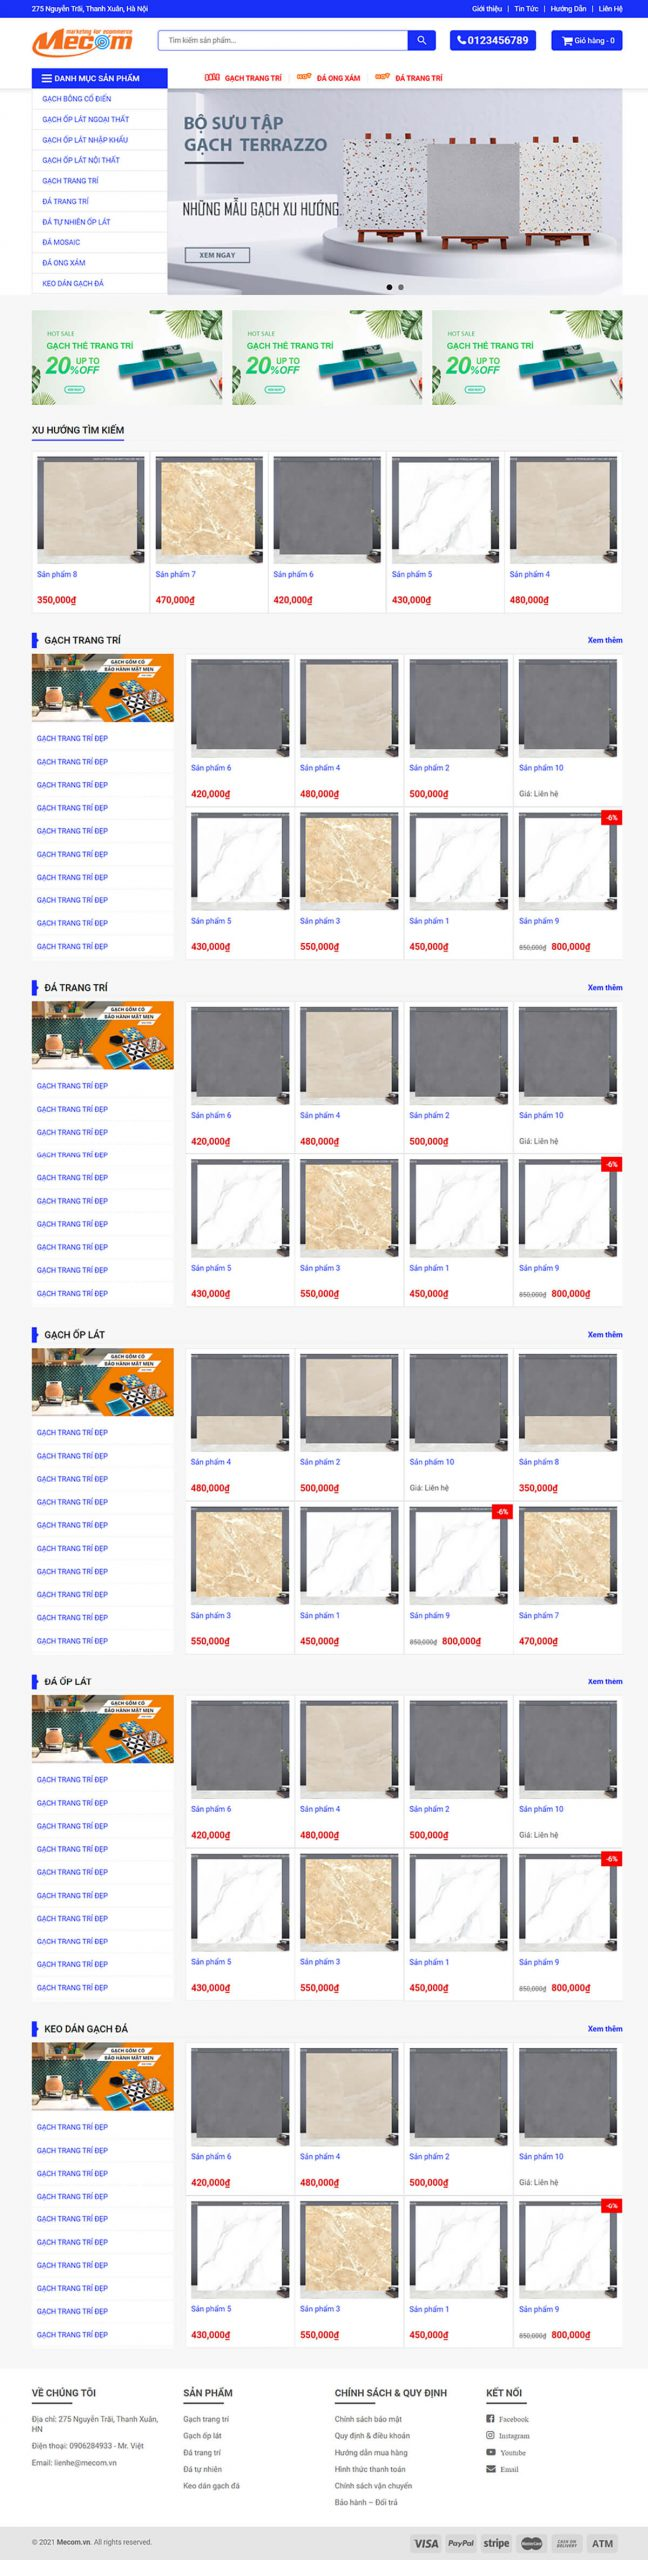 Thiết kế website vật liệu xây dựng WebVatLieu